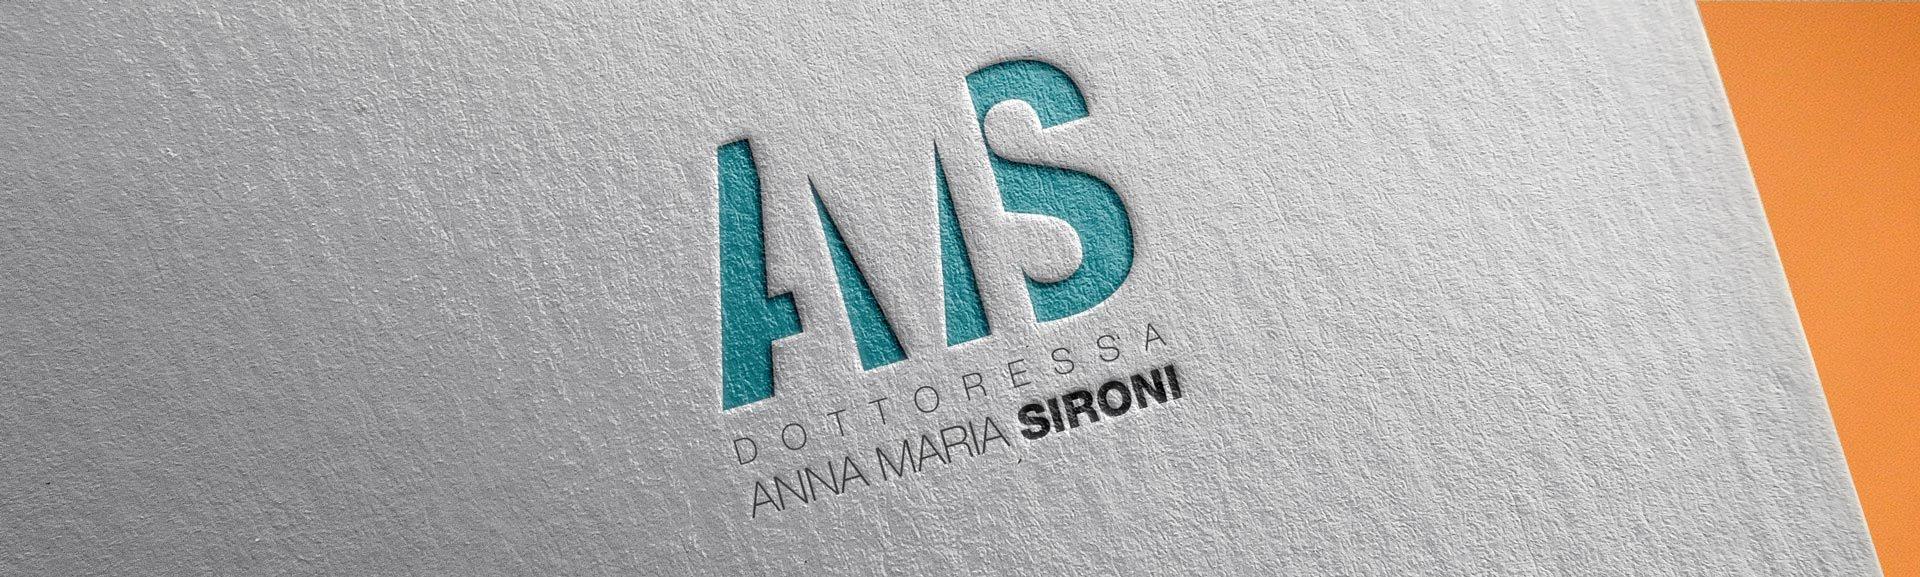 sironi_header_logo_v2